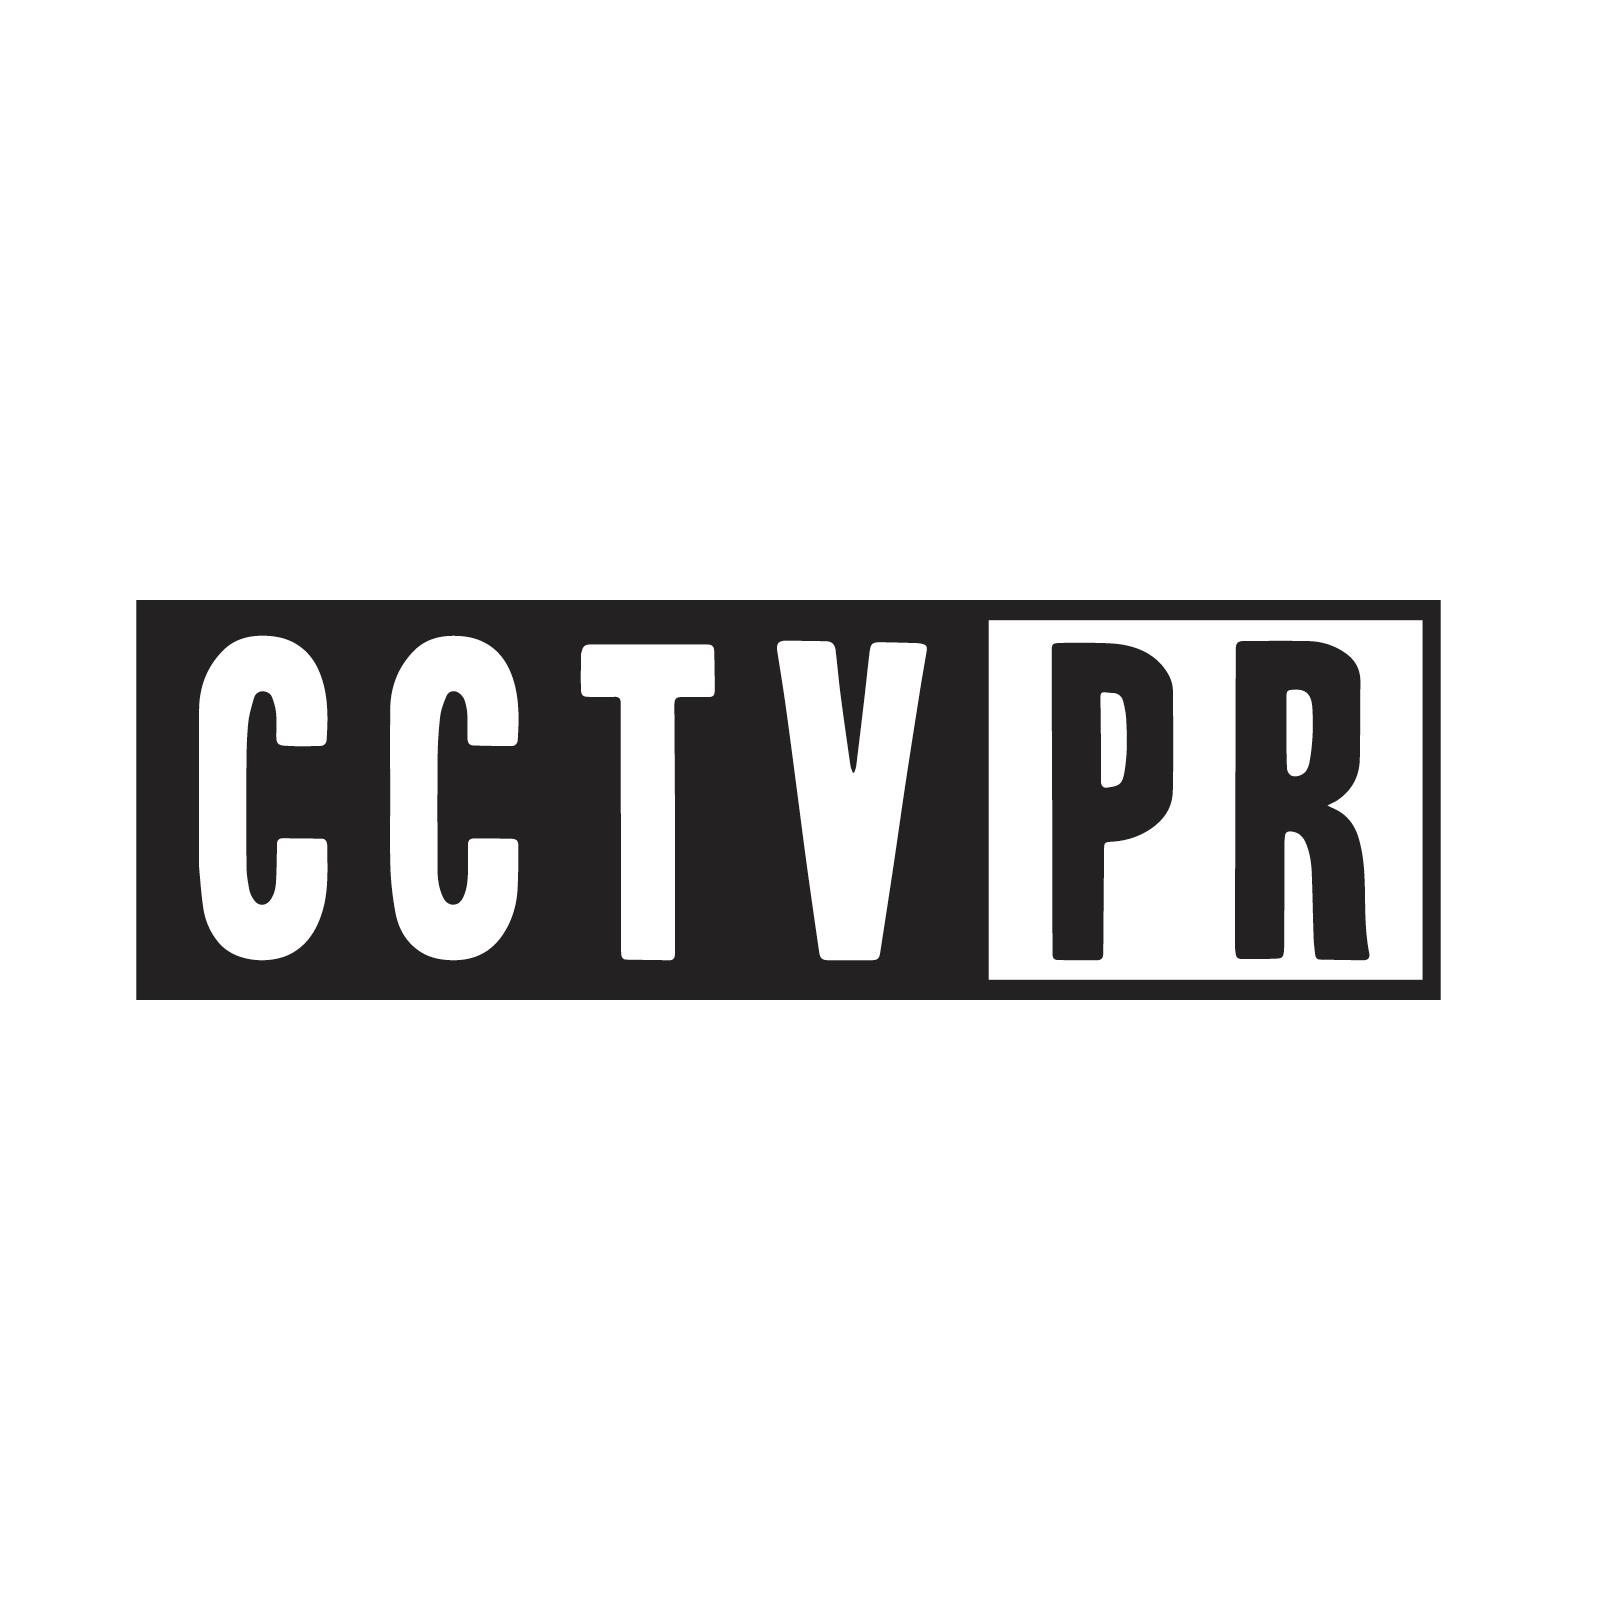 CCTV PR   Branding   By James-Lee Duffy